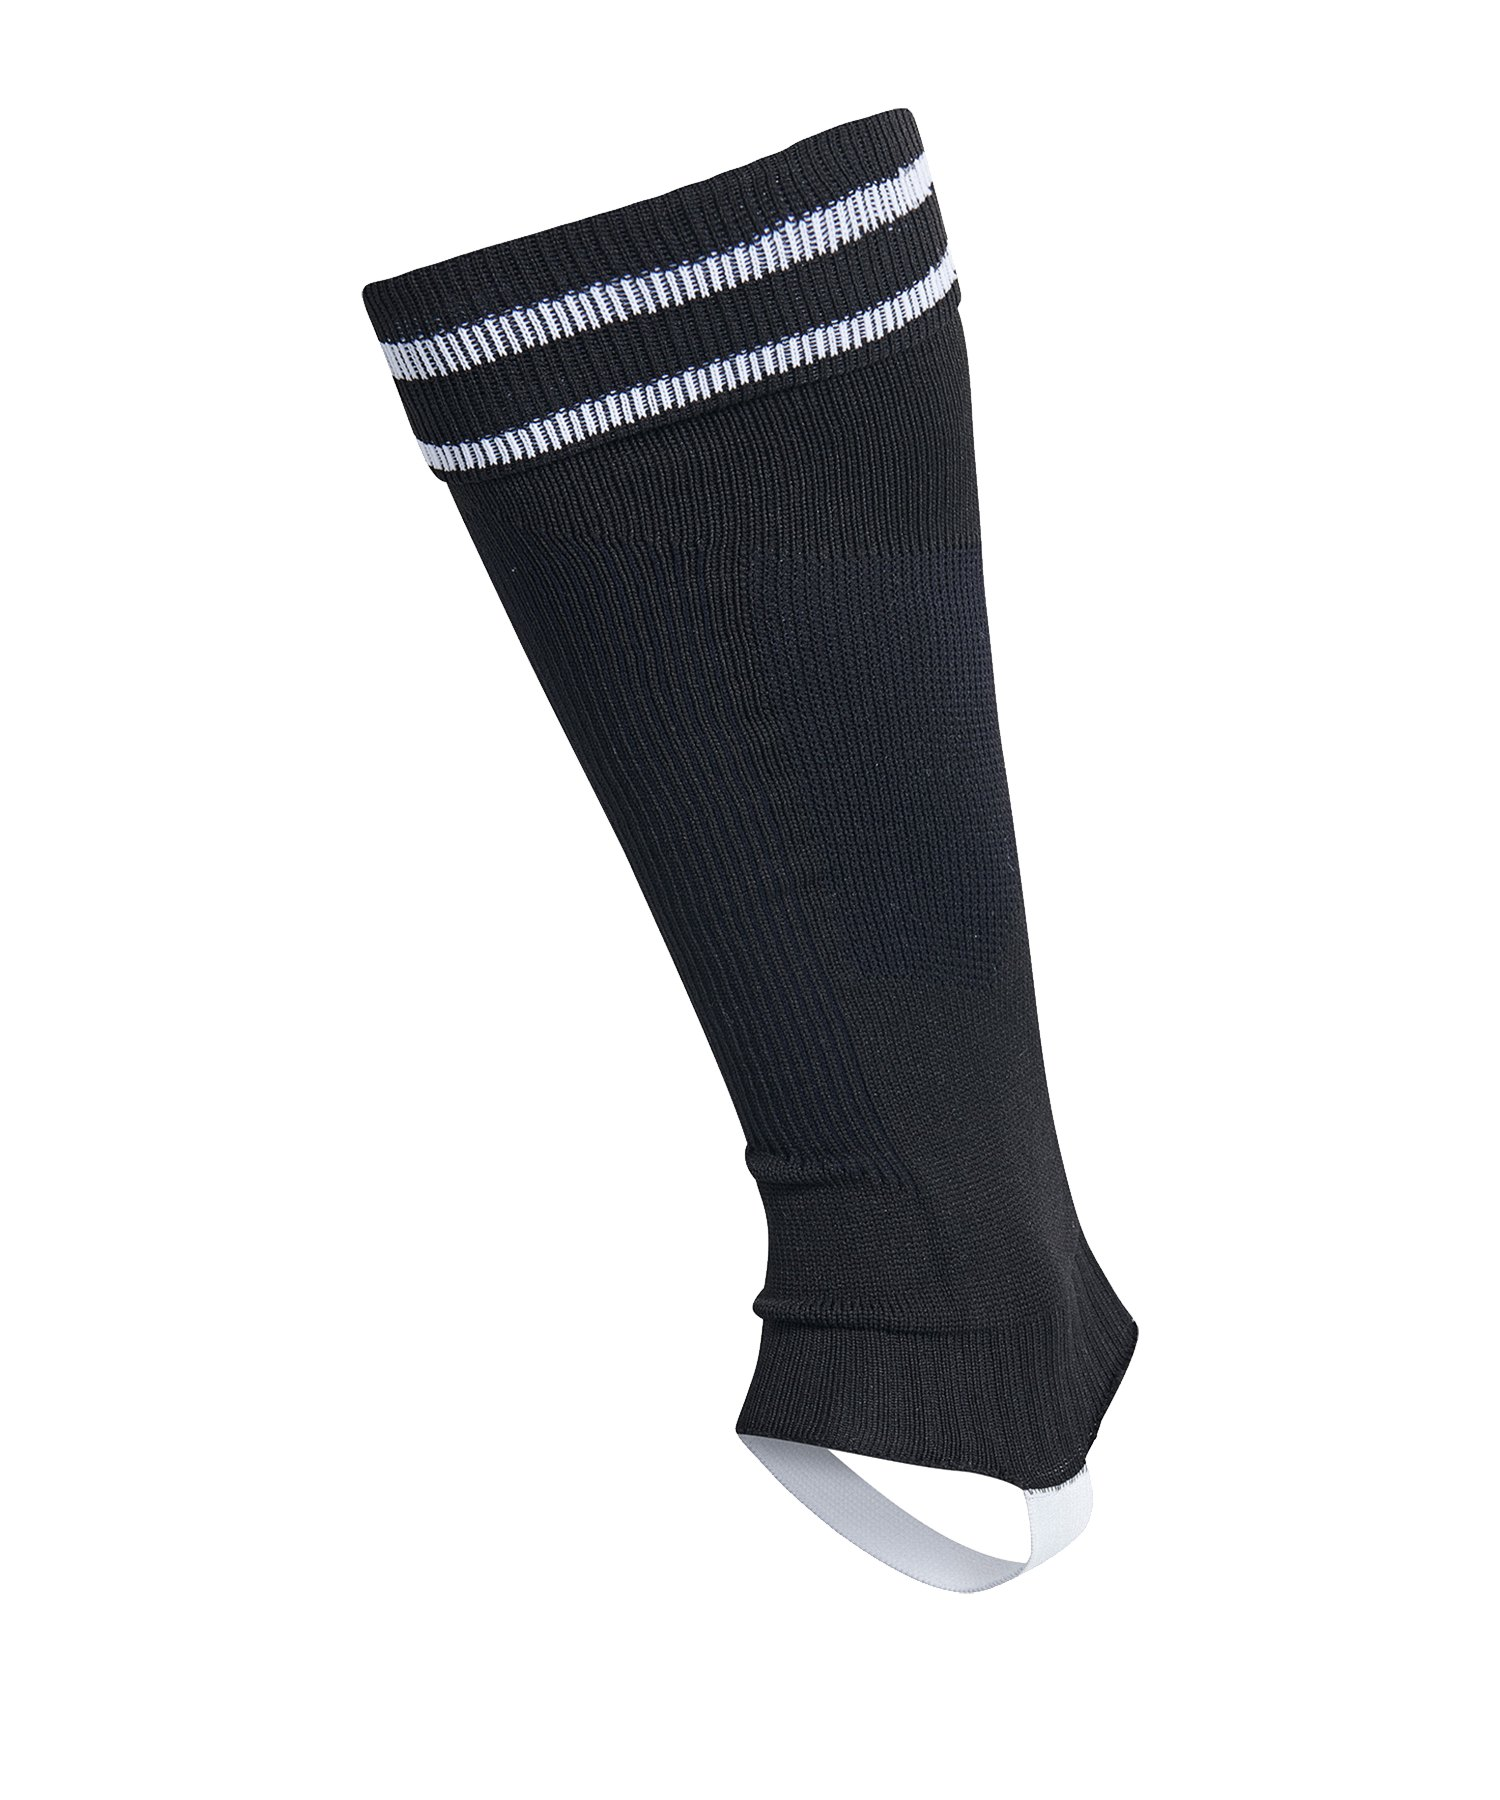 Hummel Element Football Sock Stegstutzen F2114 - Schwarz